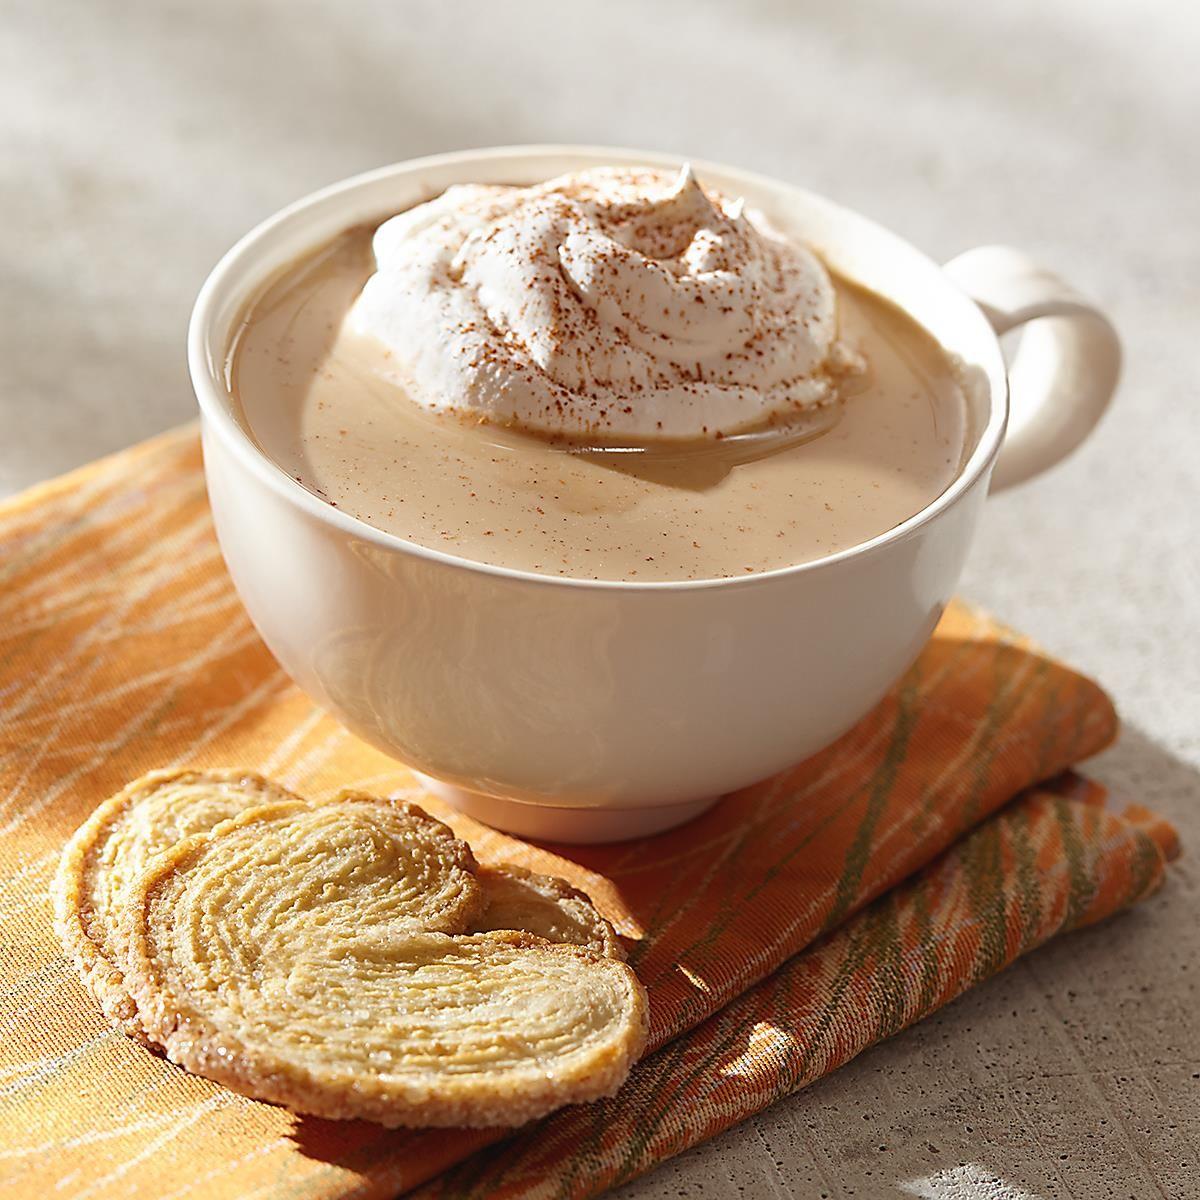 Creamy pumpkin spice coffee from dunkin donuts coffee